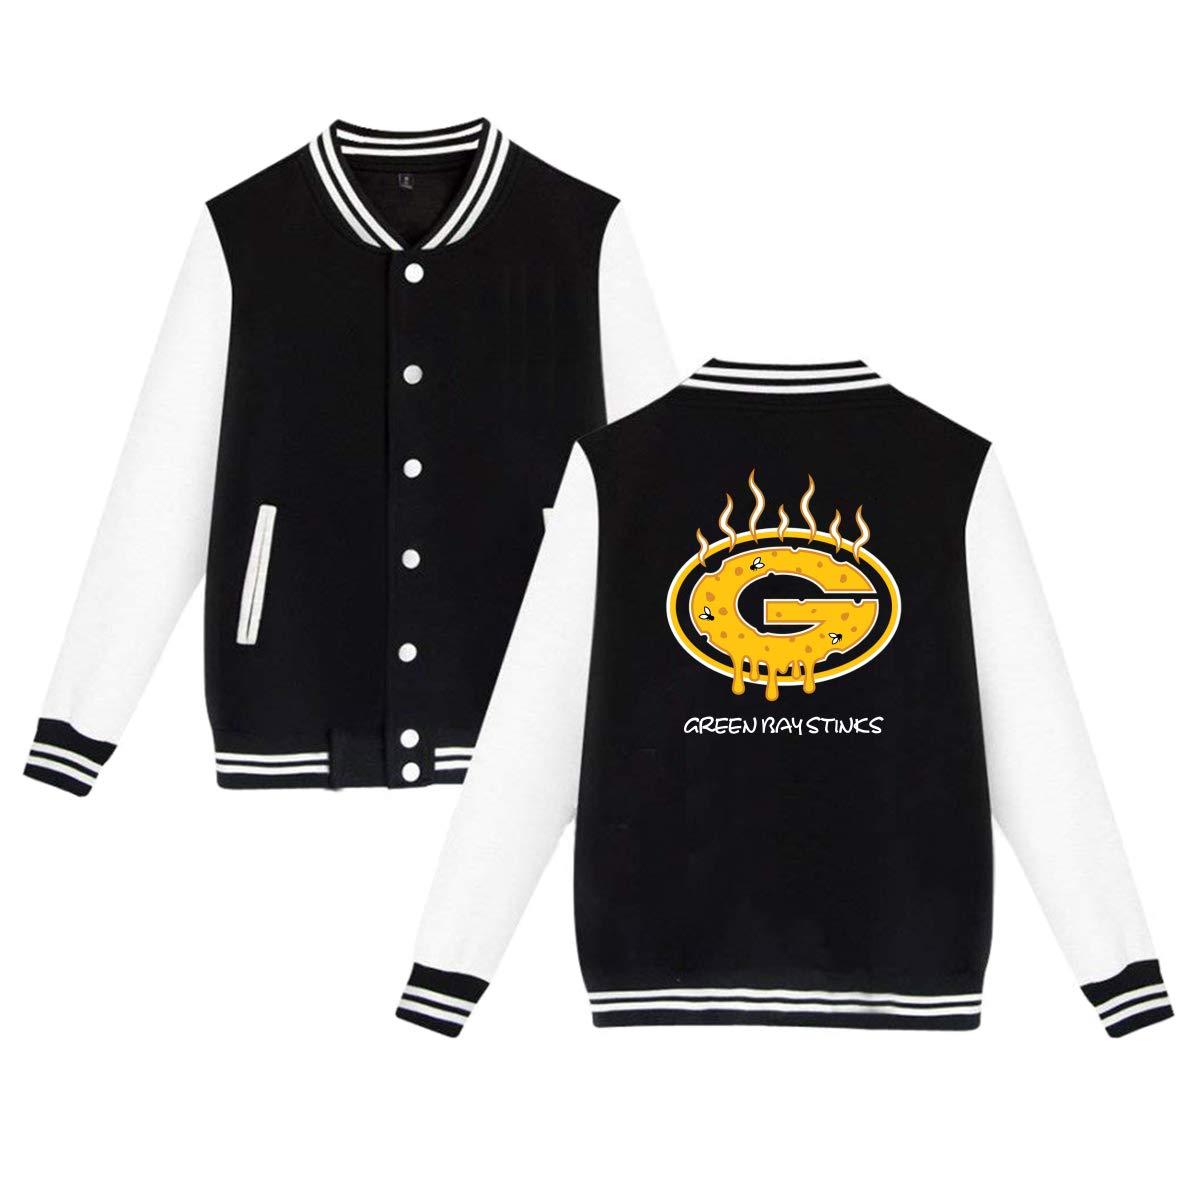 Black Unisex Men's Varsity Baseball Uniform Jacket Packers Parody Sport Coat Winter Sweatshirt Velvet